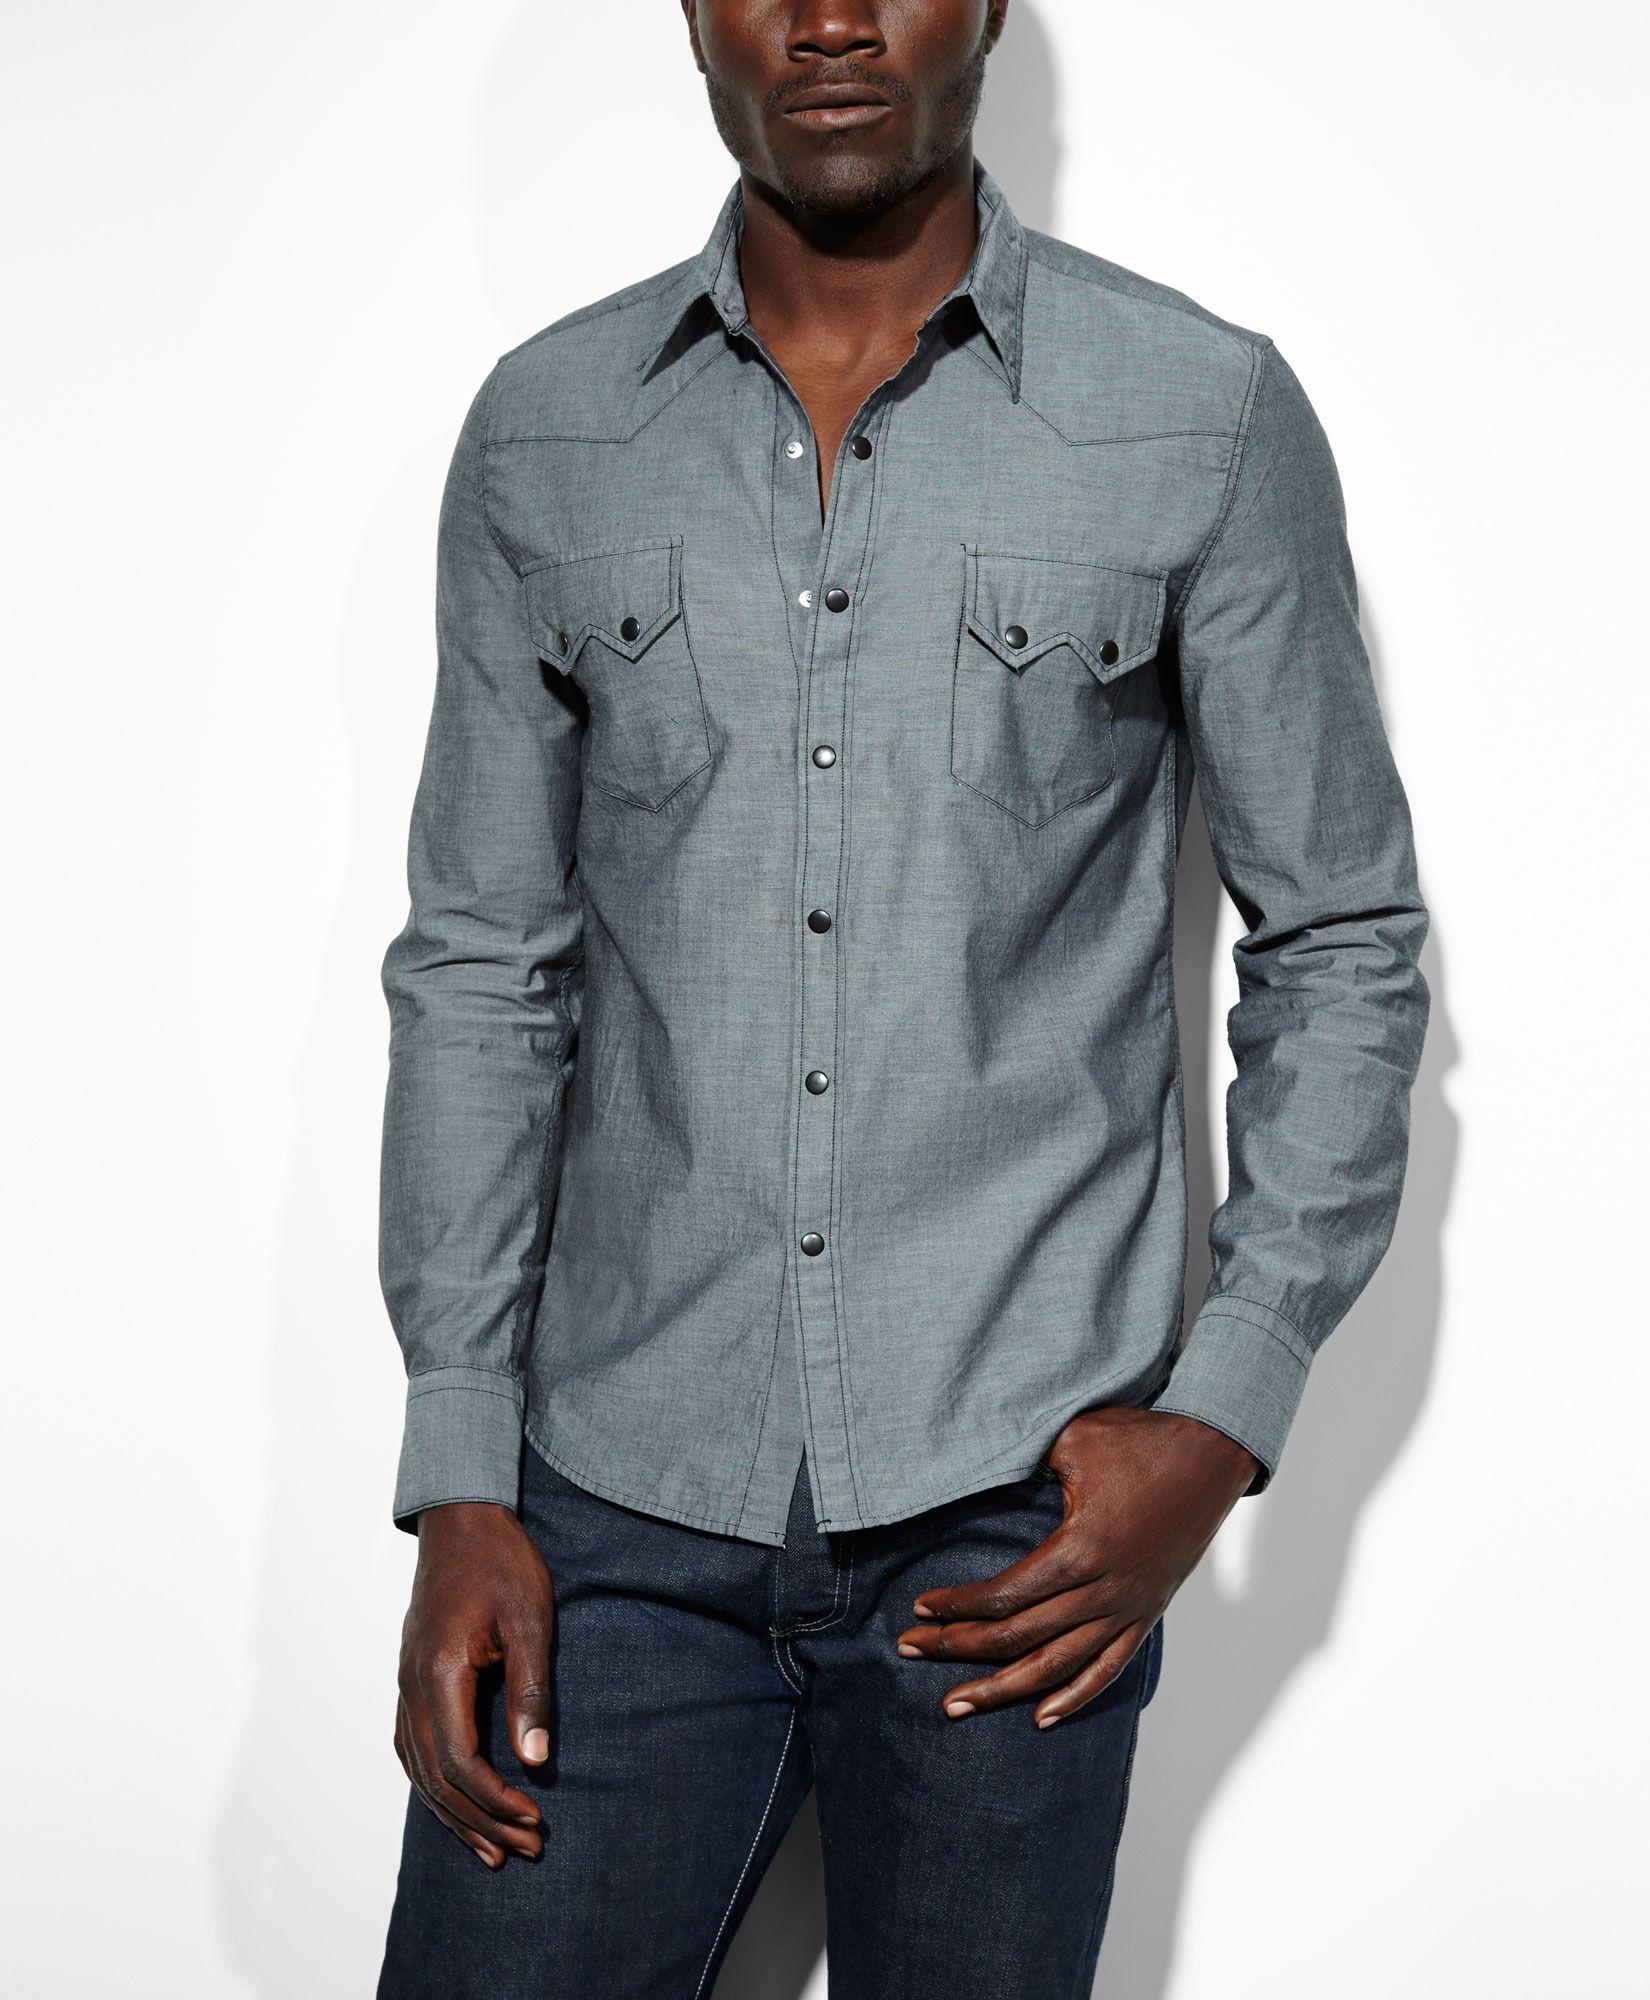 7094966e79 Levis Sawtooth Western Slim Fit Denim Shirt - BCD Tofu House